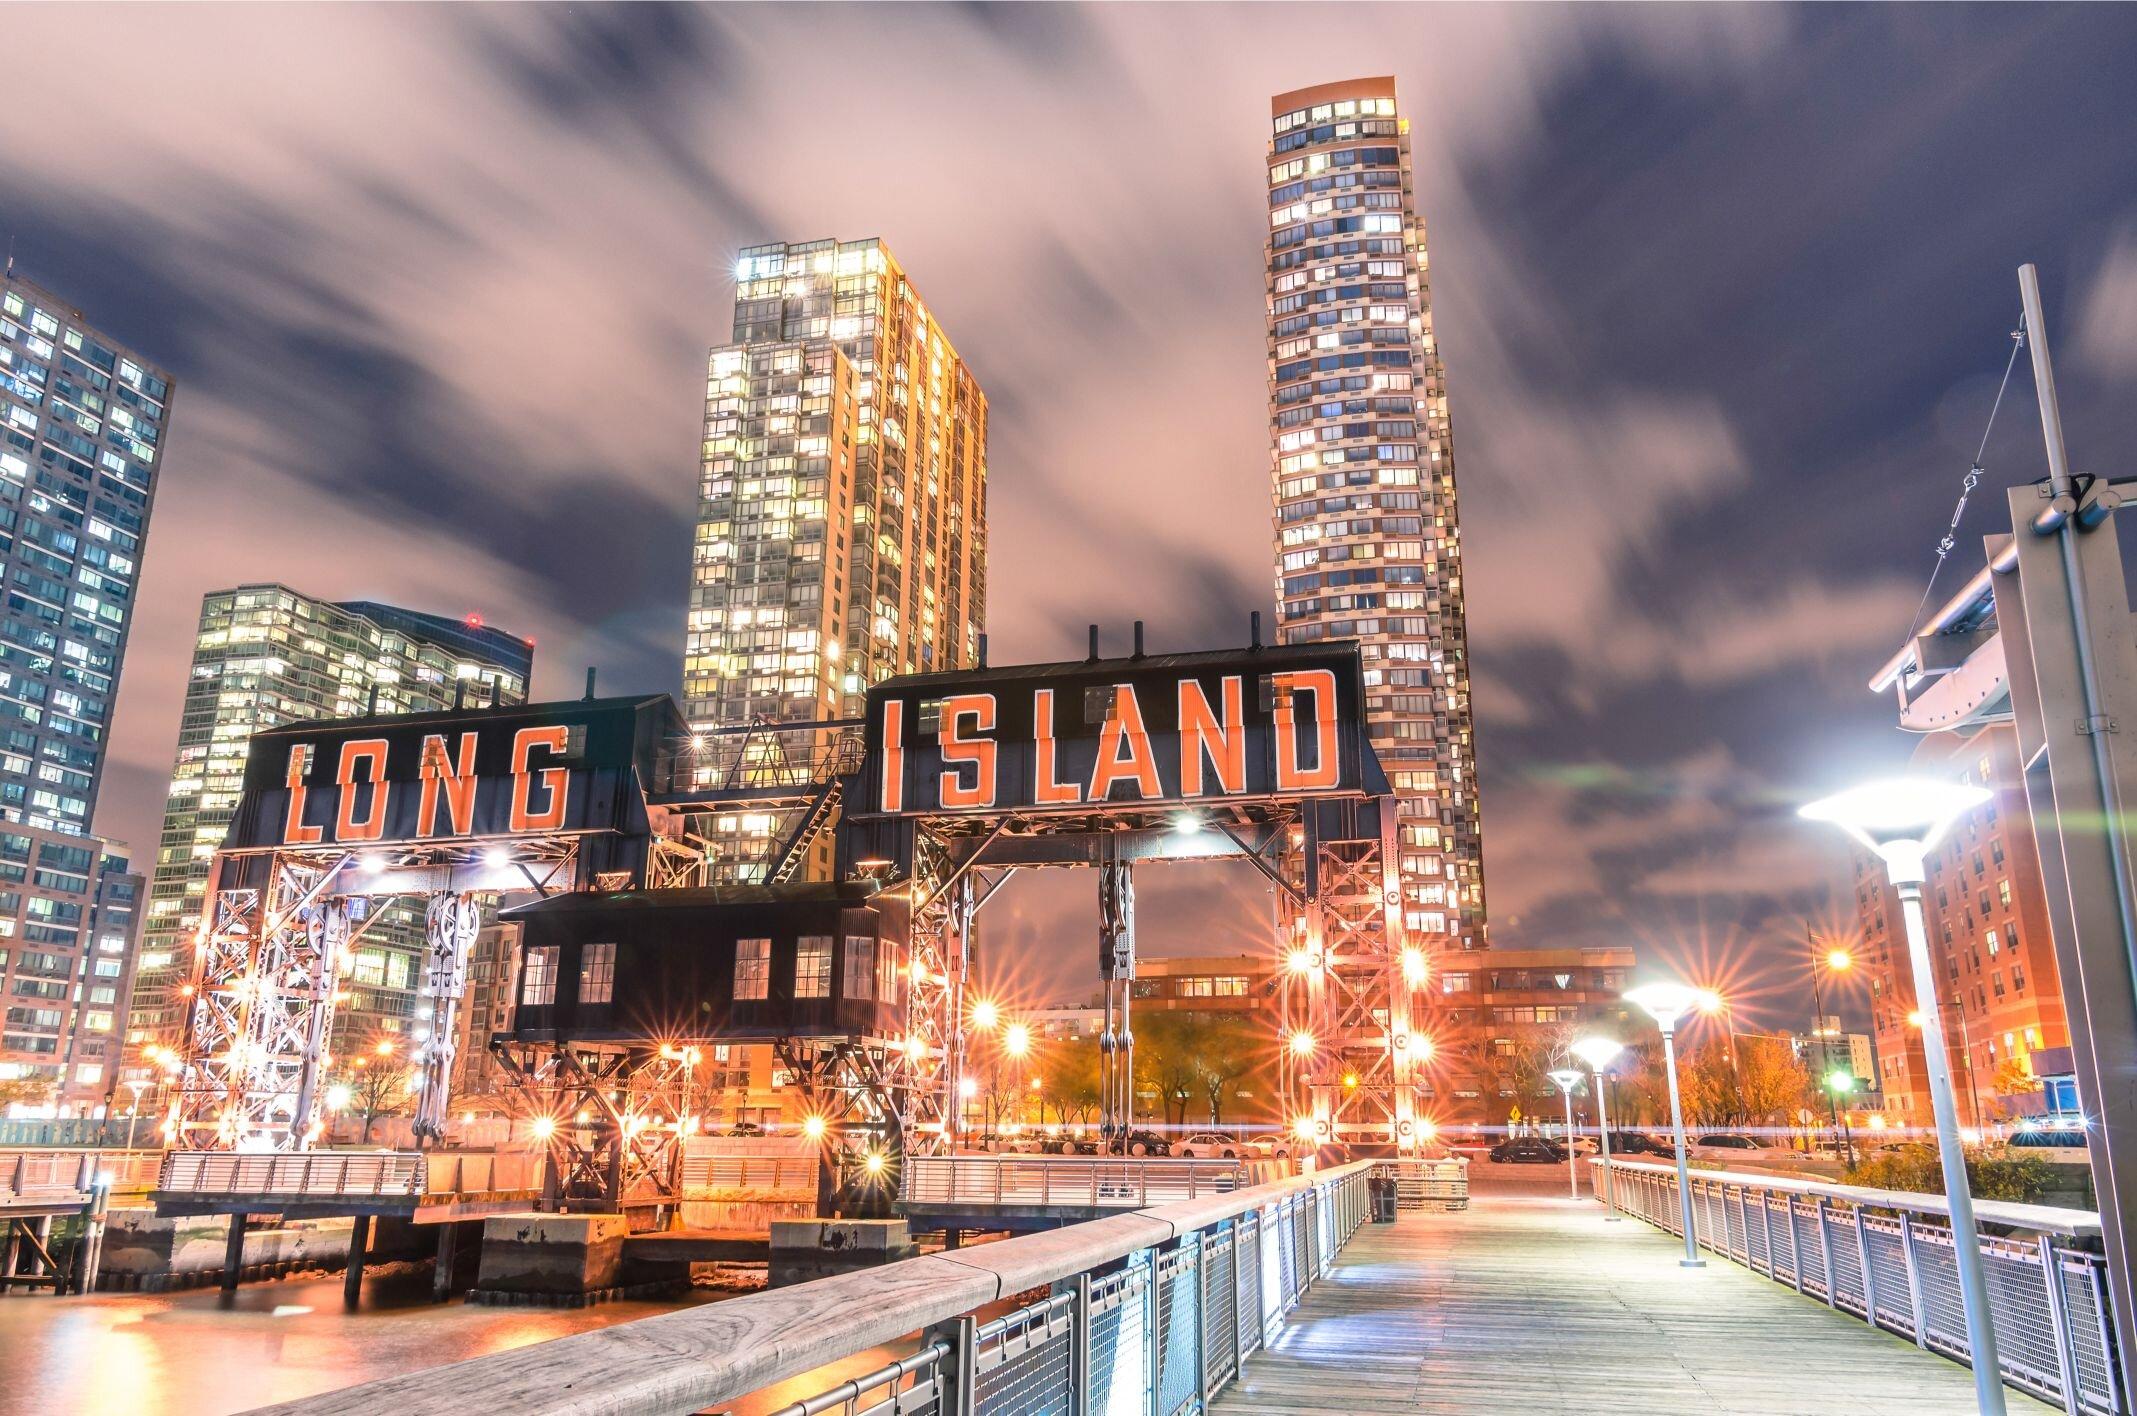 Servicing Stonybrook & Long Island, NY